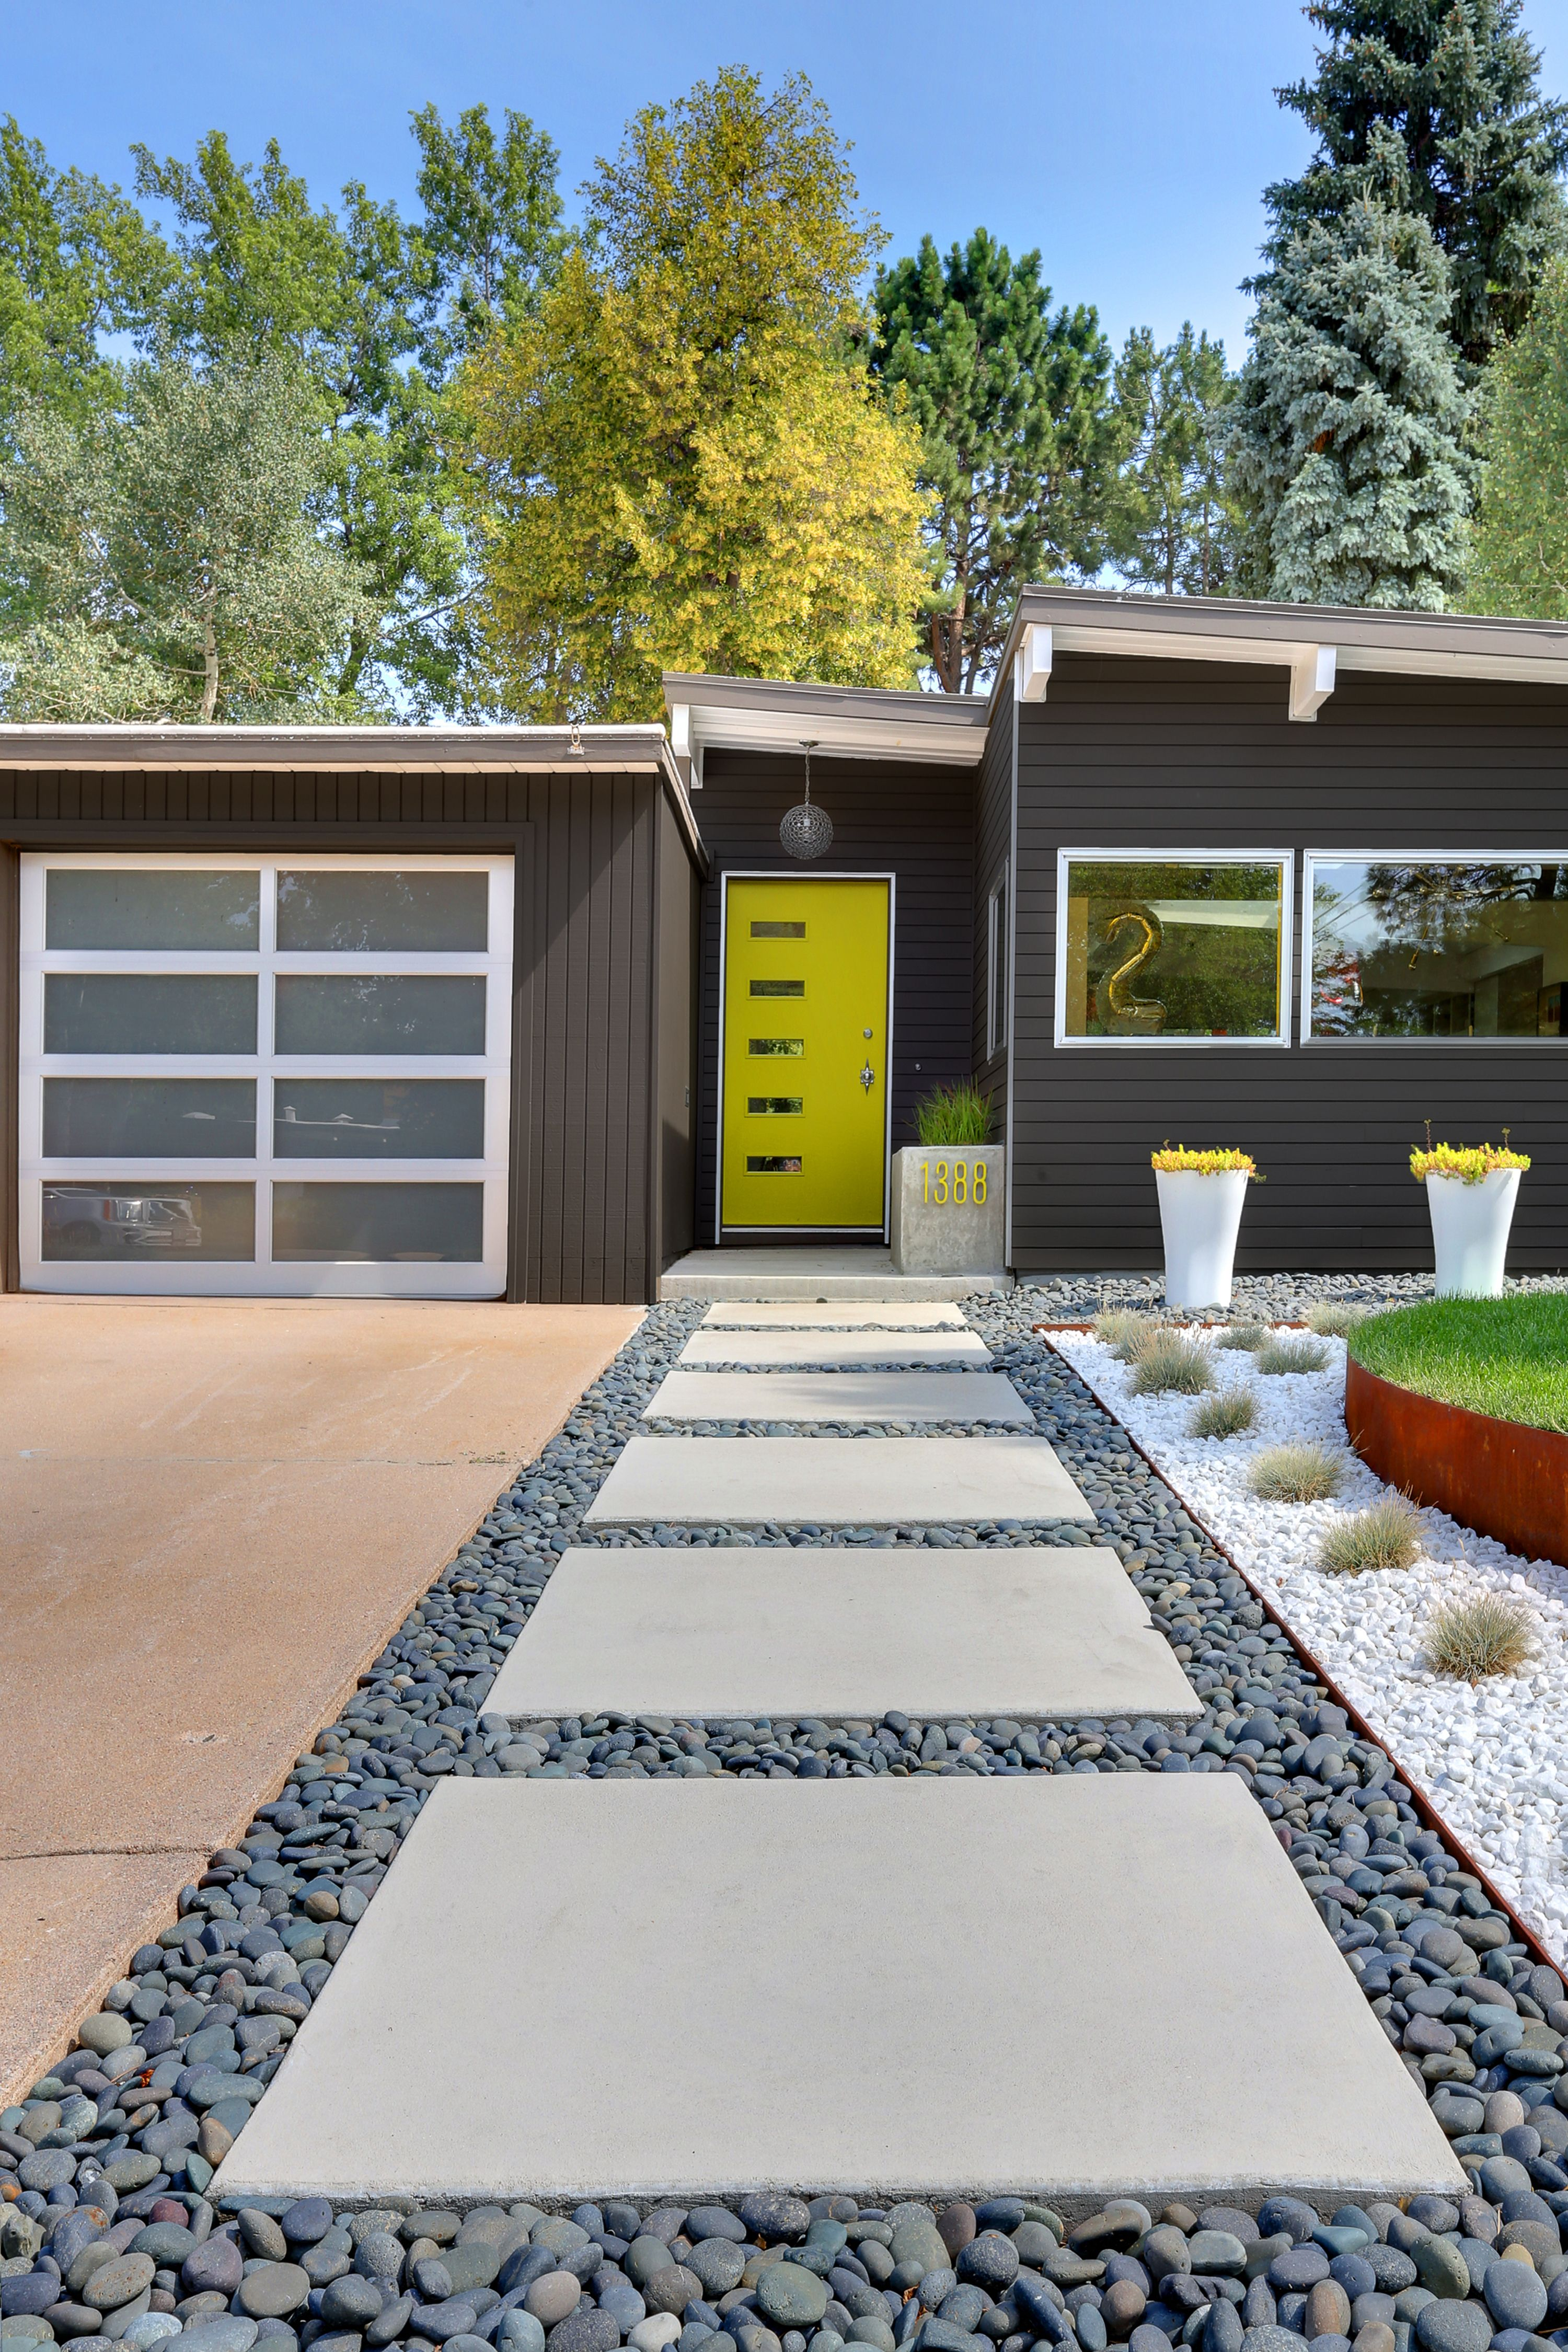 A Low Maintenance Landscape For A Midcentury Denver Home Dwell Modern Landscaping Modern Landscape Design Pathway Landscaping